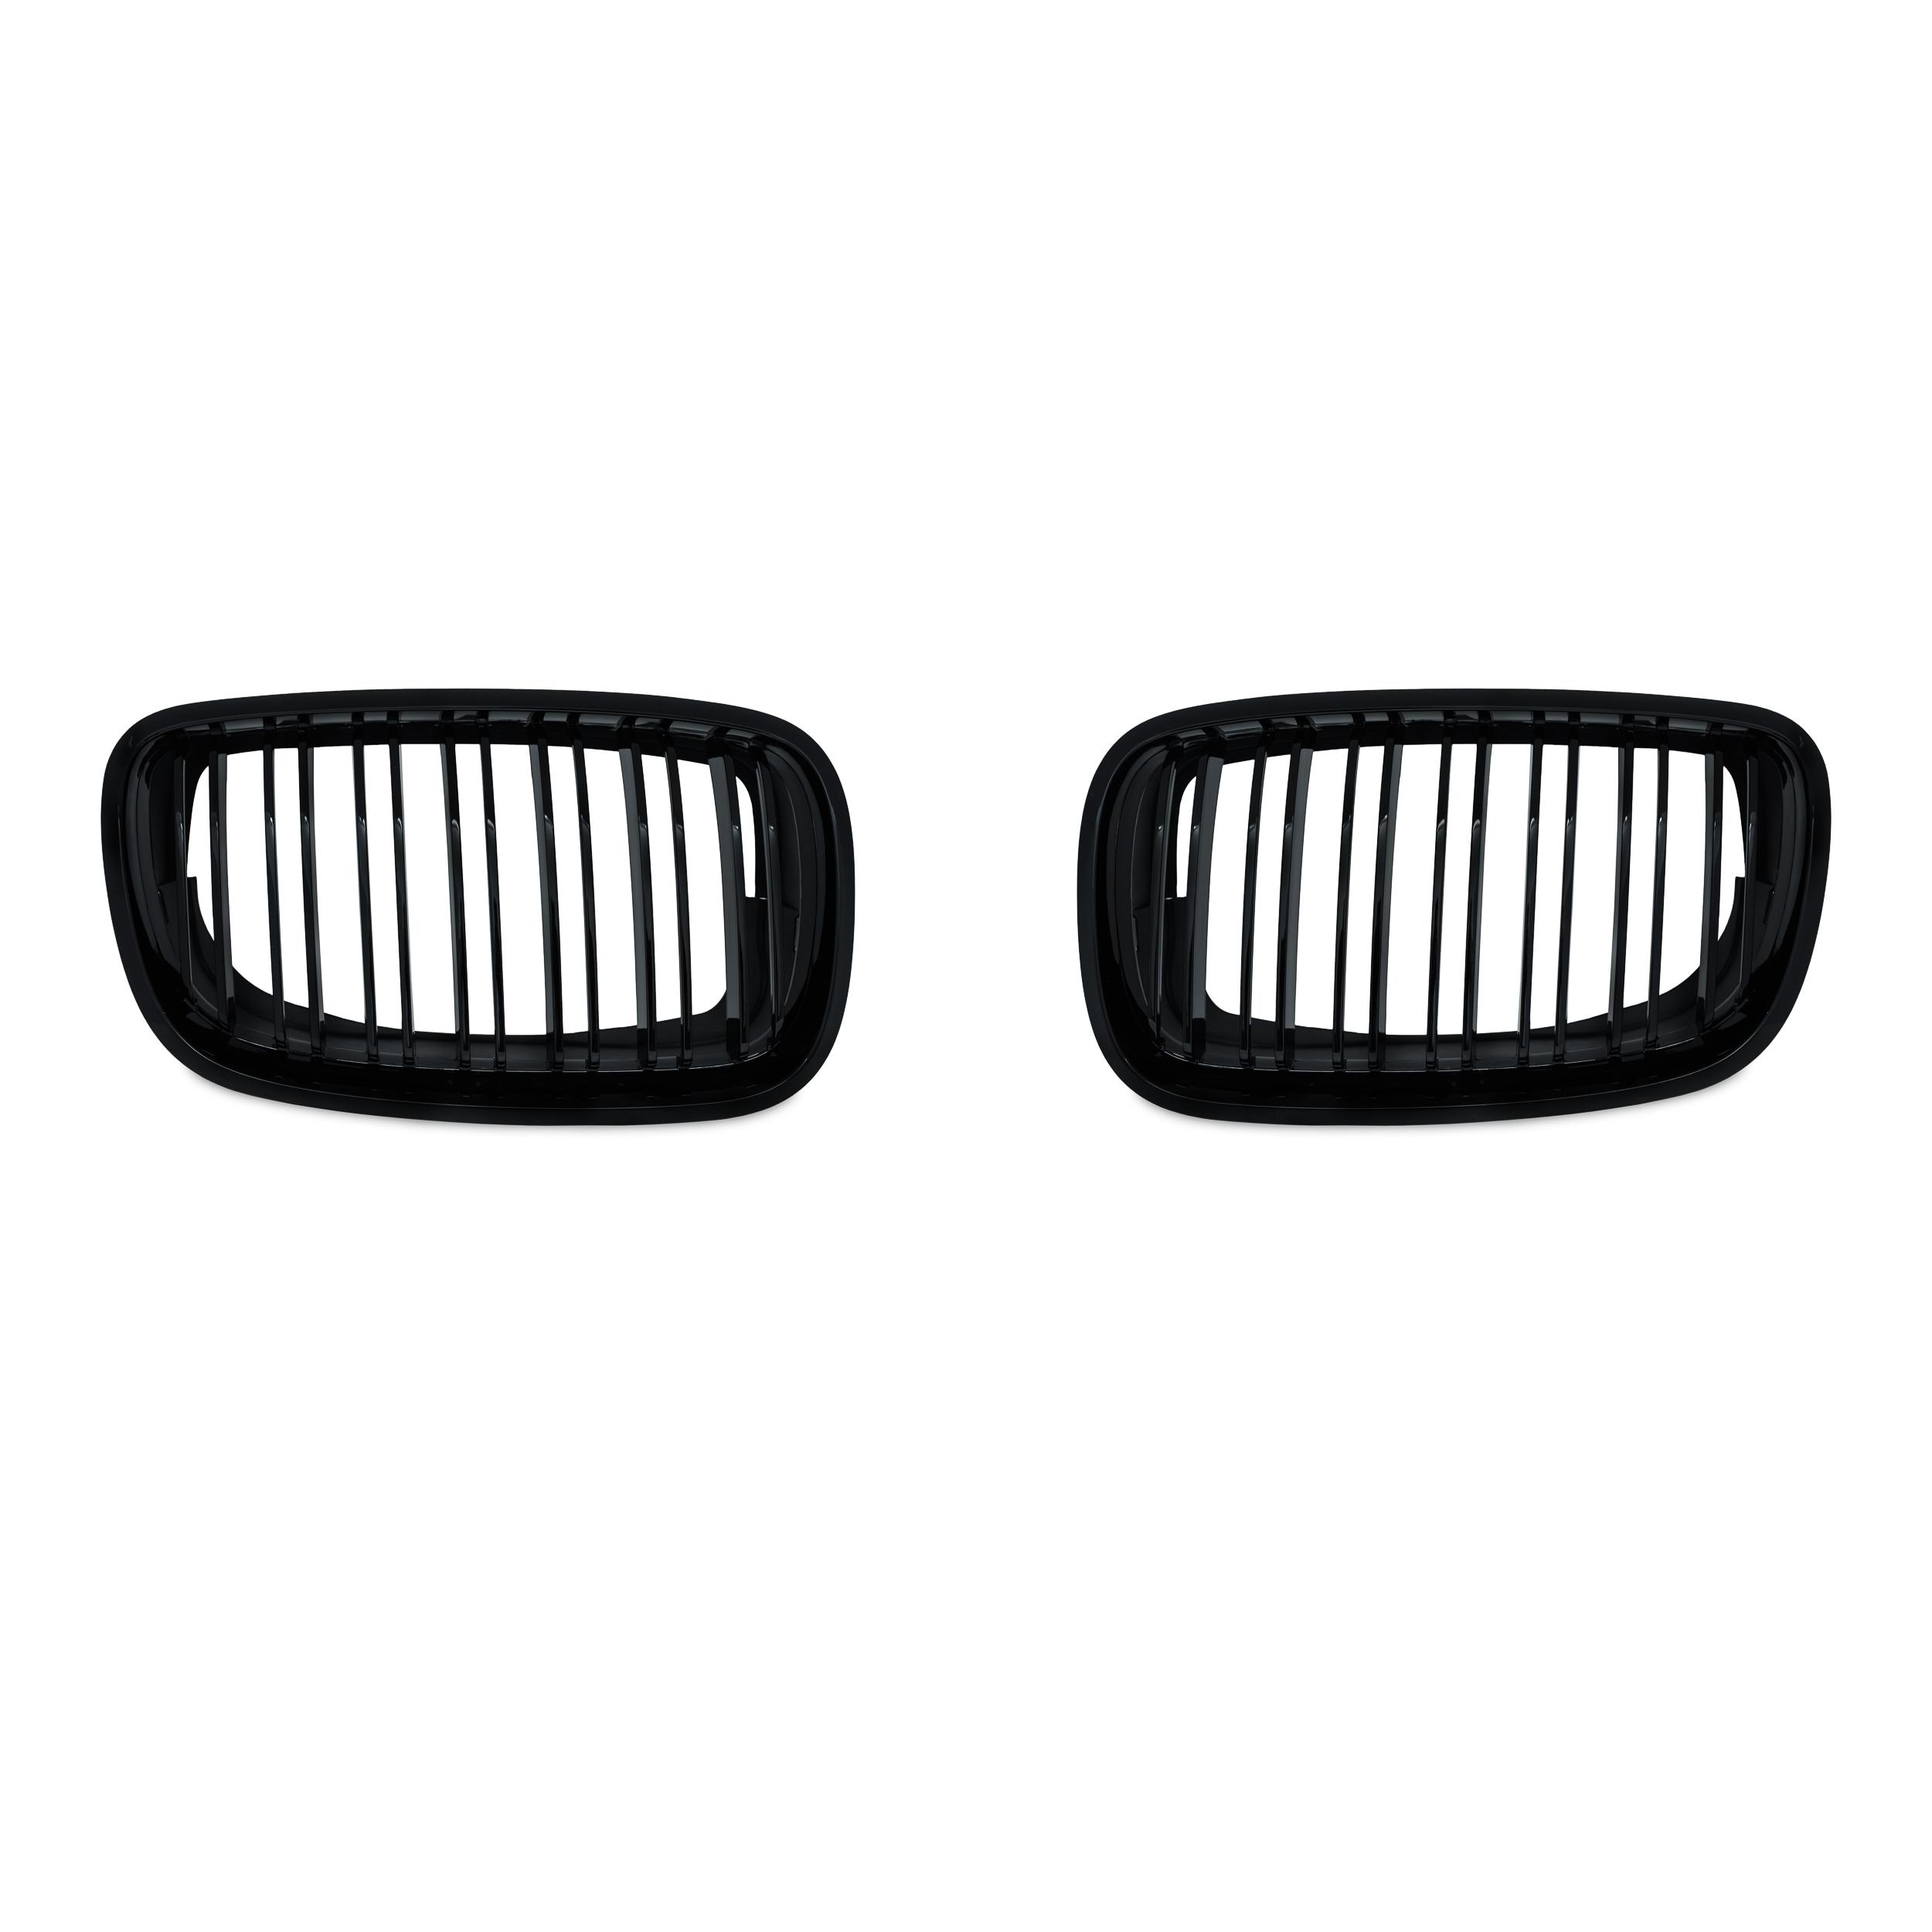 JOM Frontgrill med dobbelt ribbe i blank sort til BMW X5 E70 årgang 2007 -2013 Styling